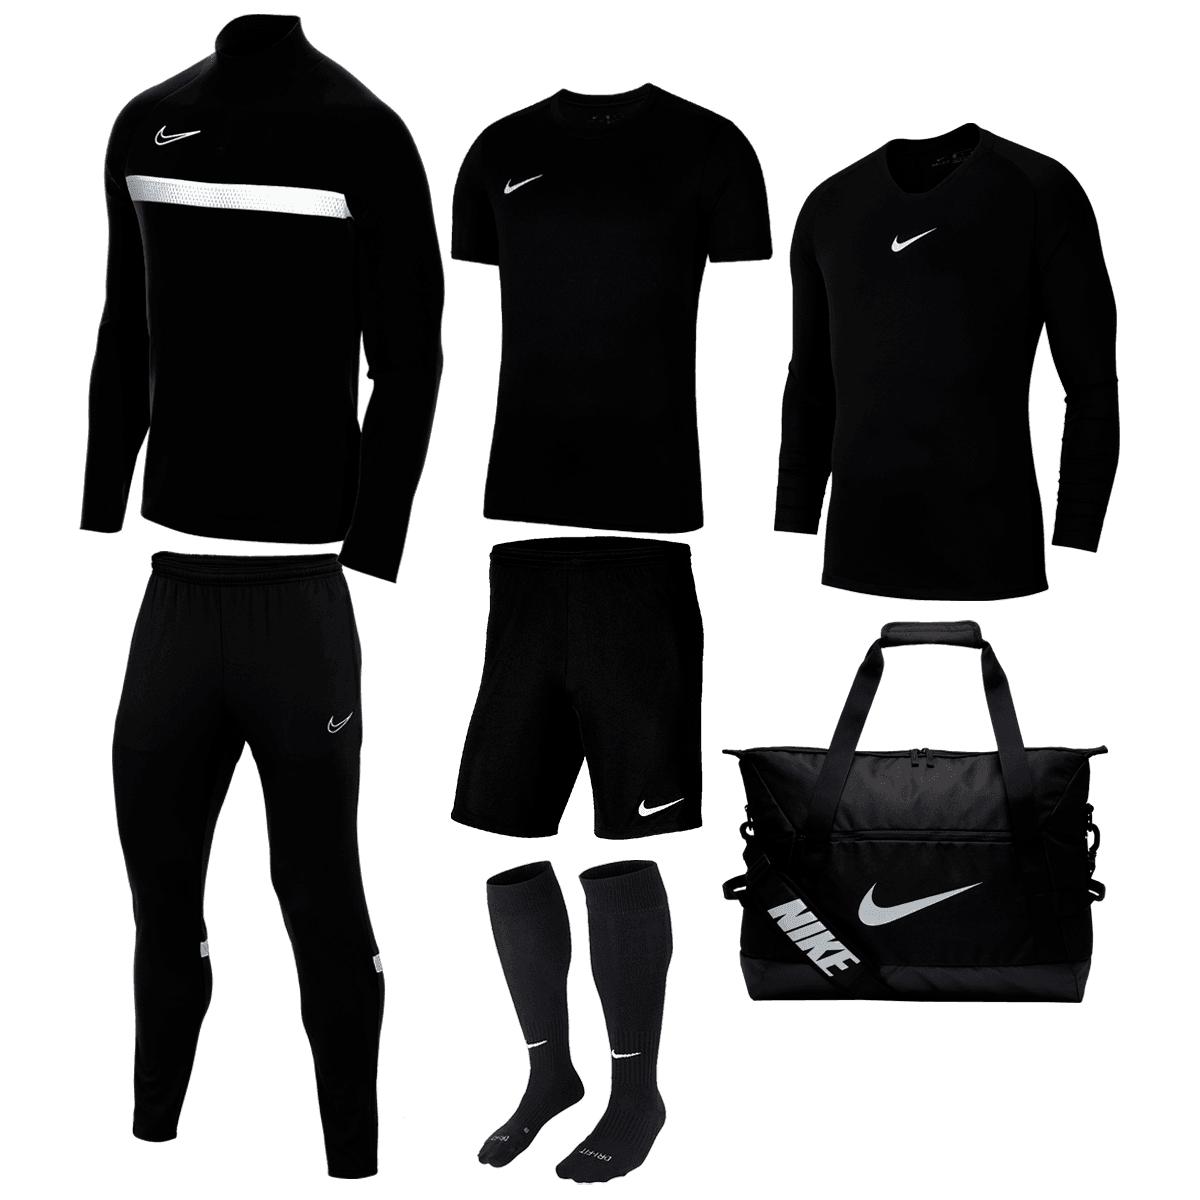 Ensemble Nike Academy - 6 Pièces + 1 Sac